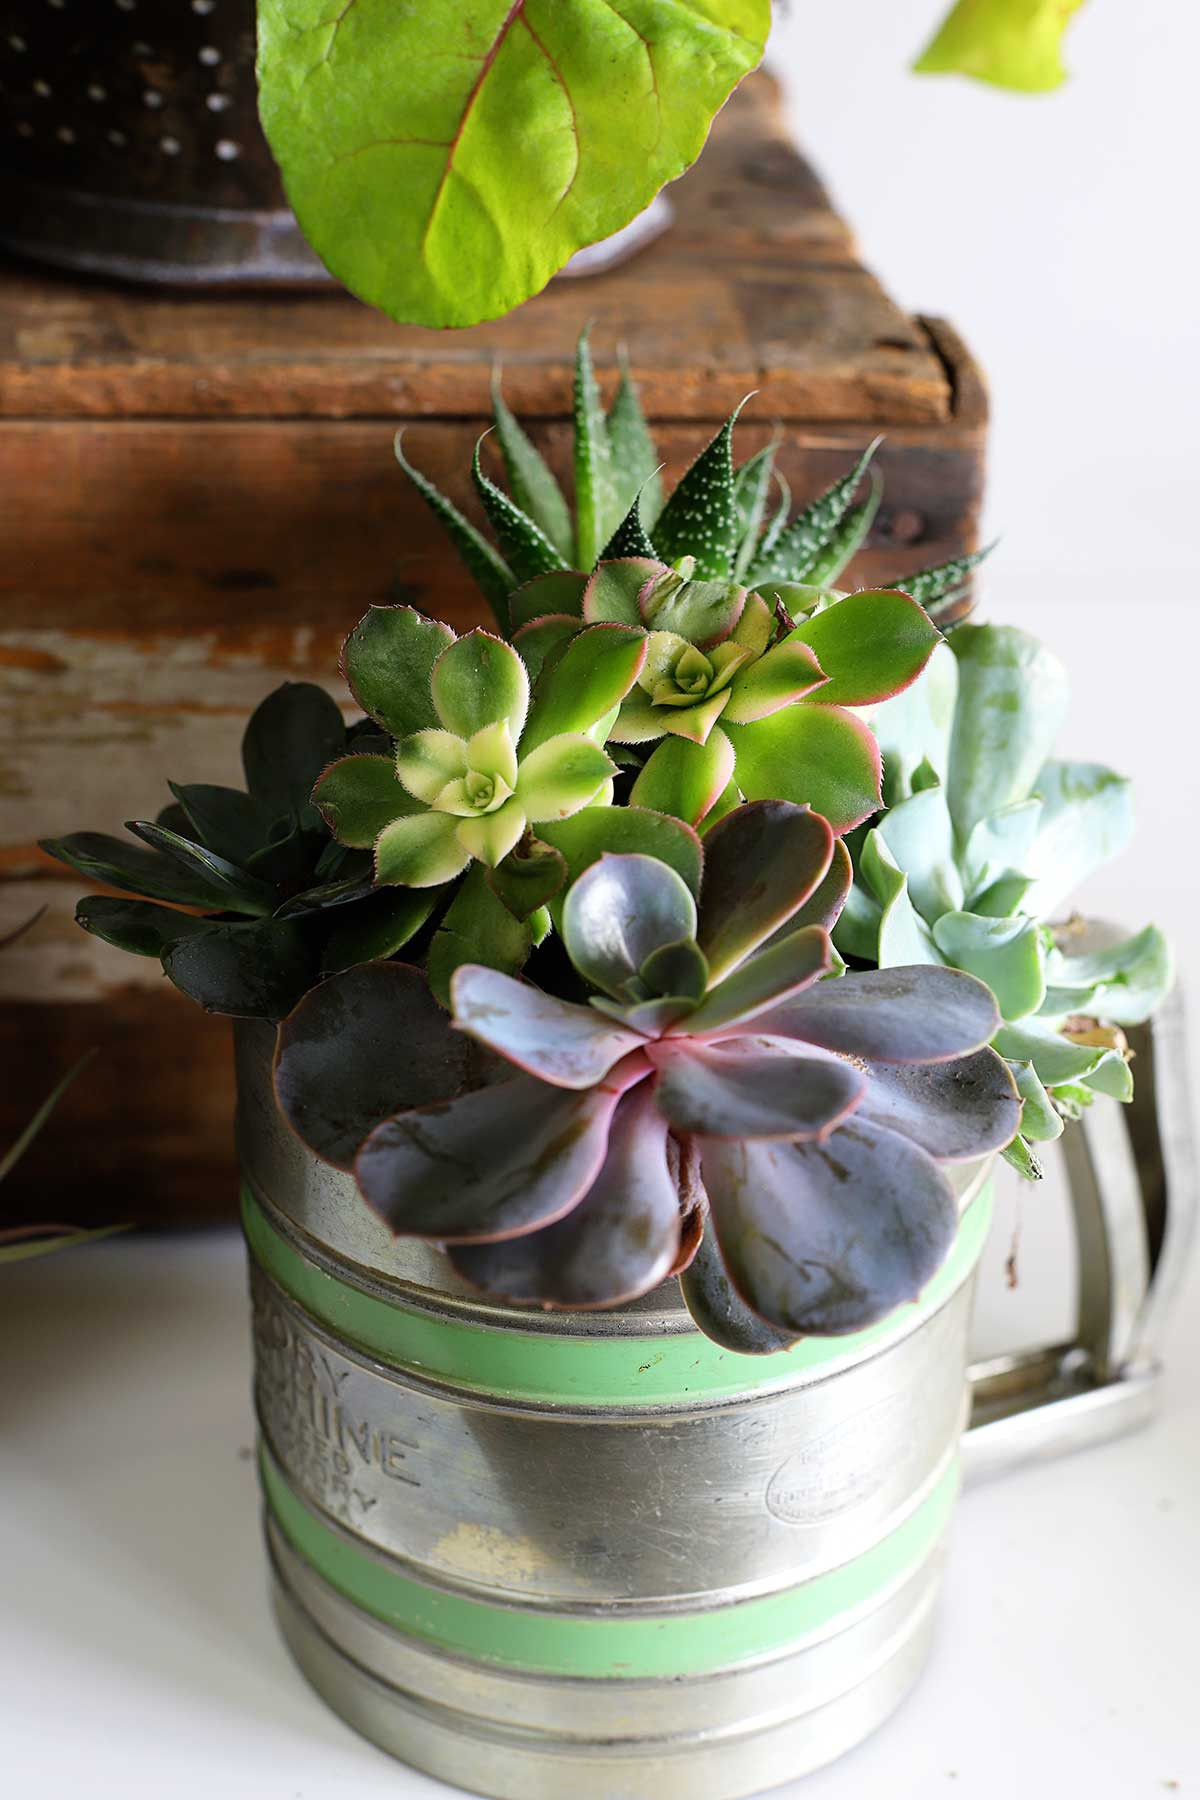 vintage kitchen tools repurposed into planters